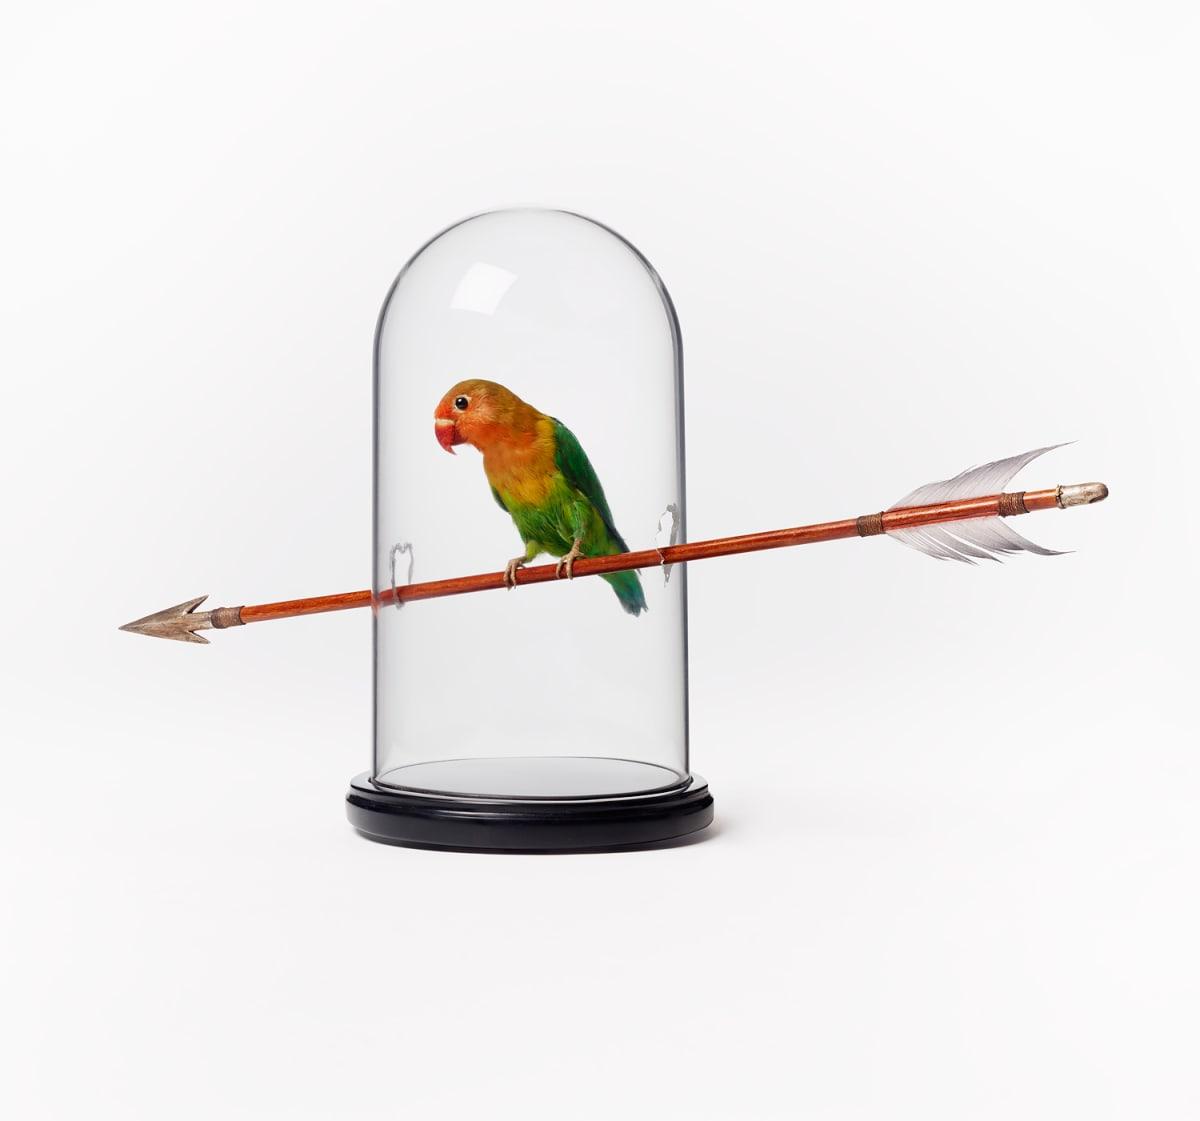 Nancy FOUTS, Bird on Arrow, 2013